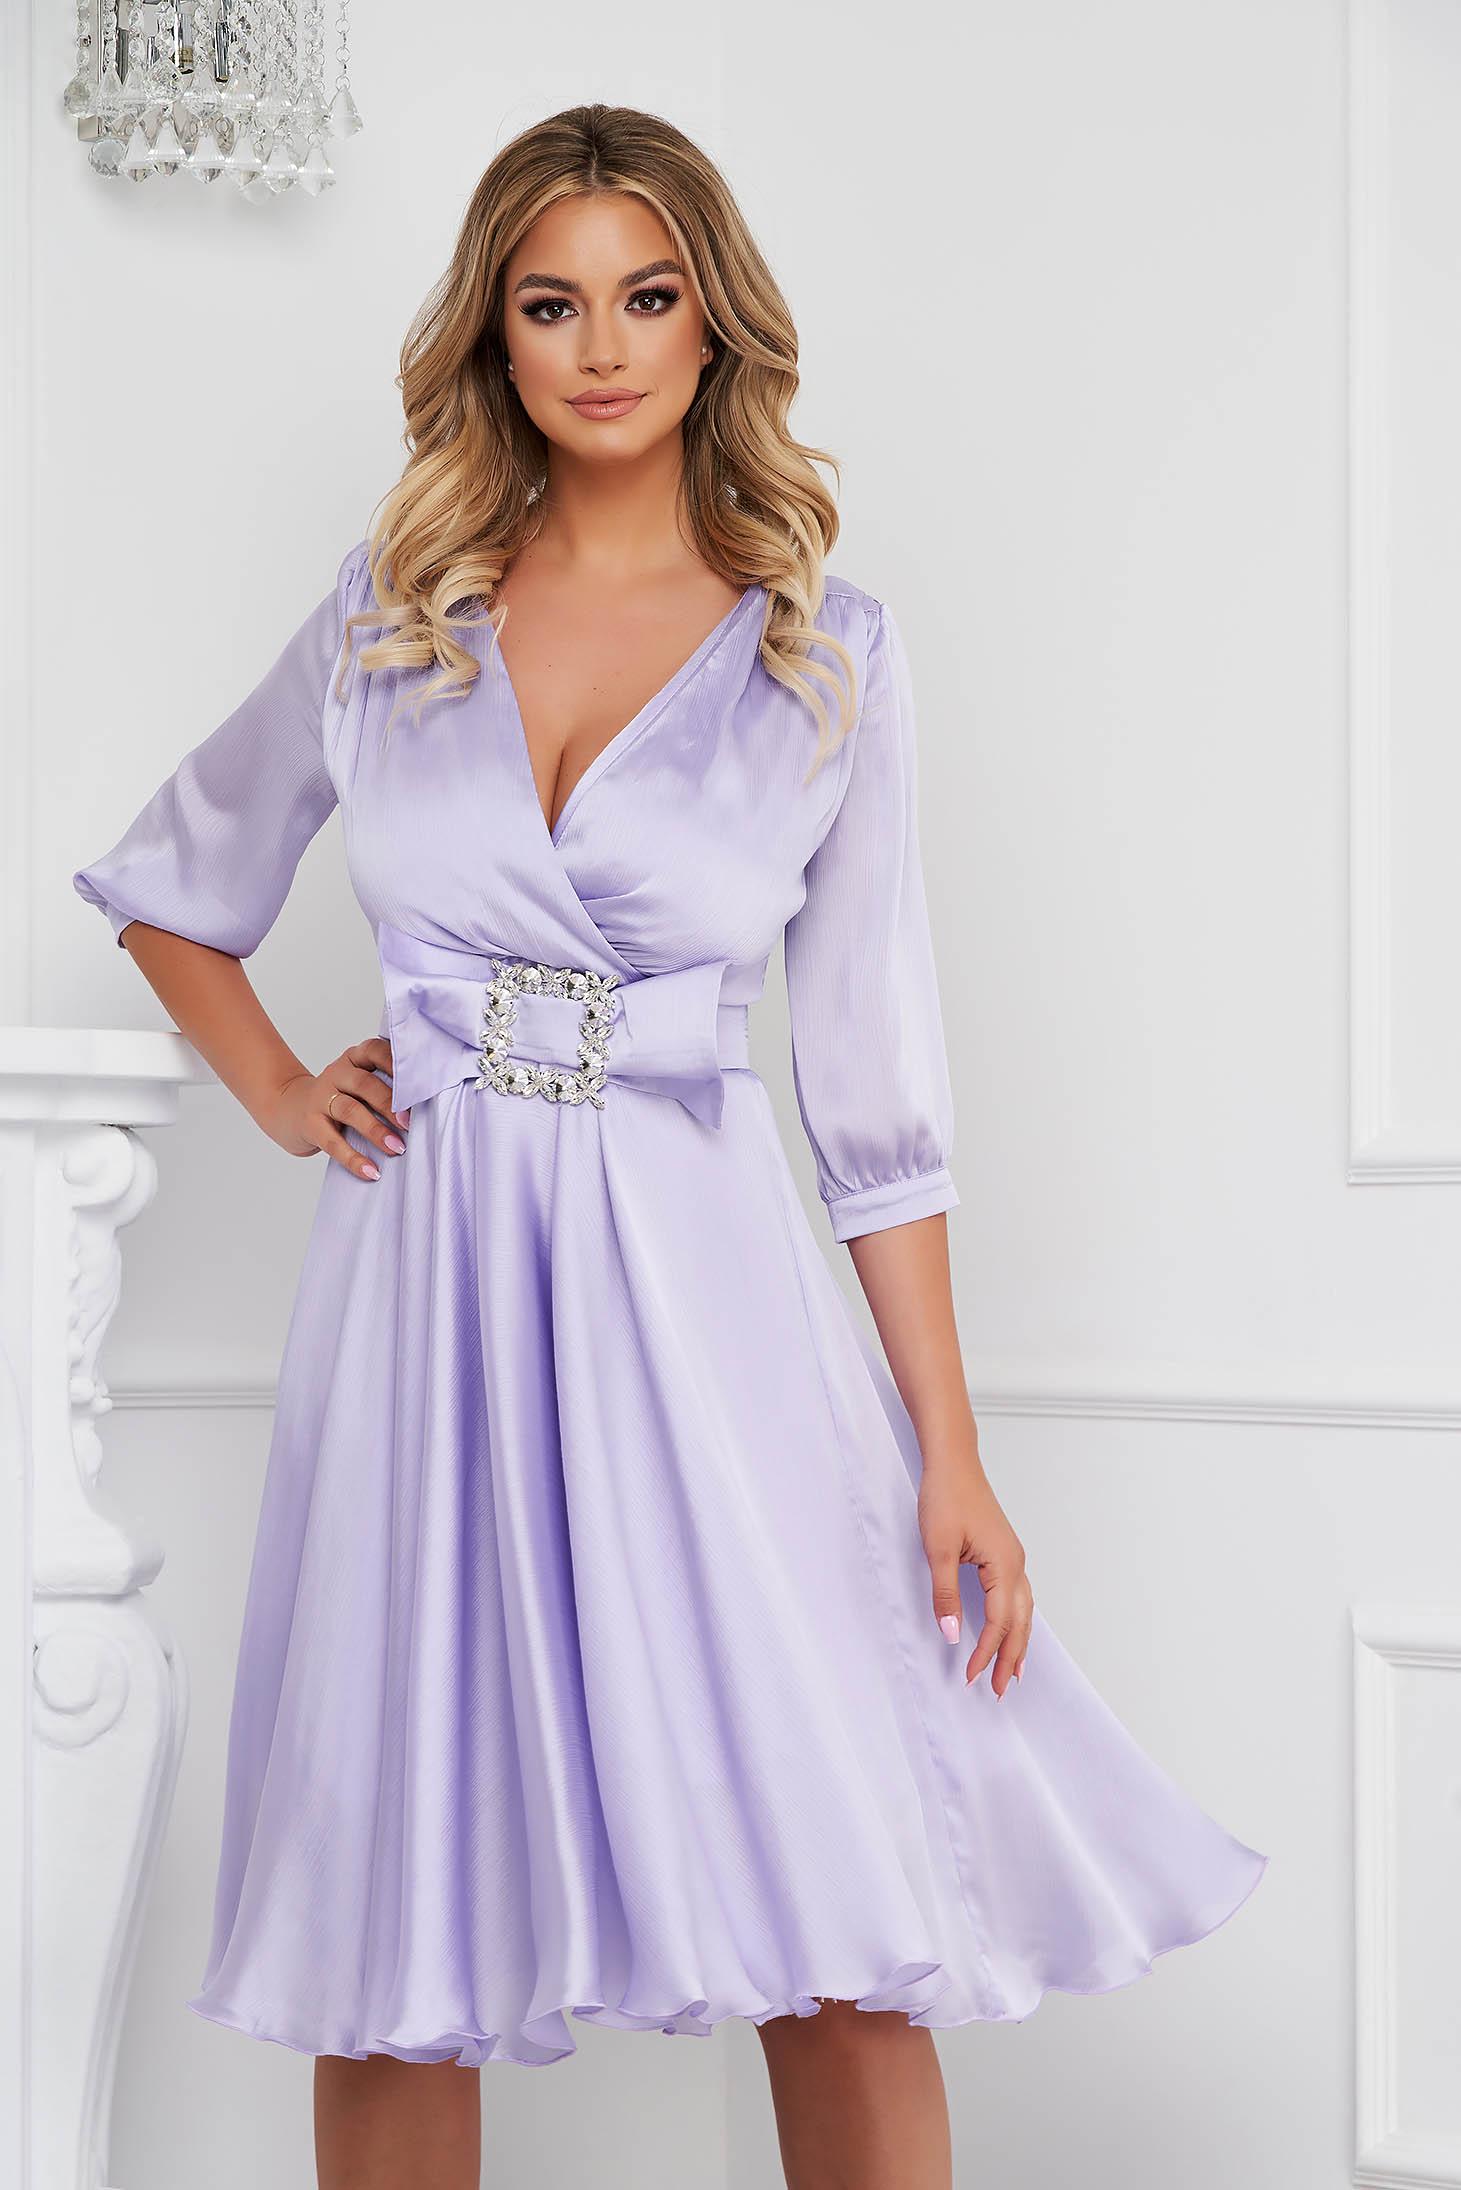 Lila dress elegant midi cloche from satin buckle accessory